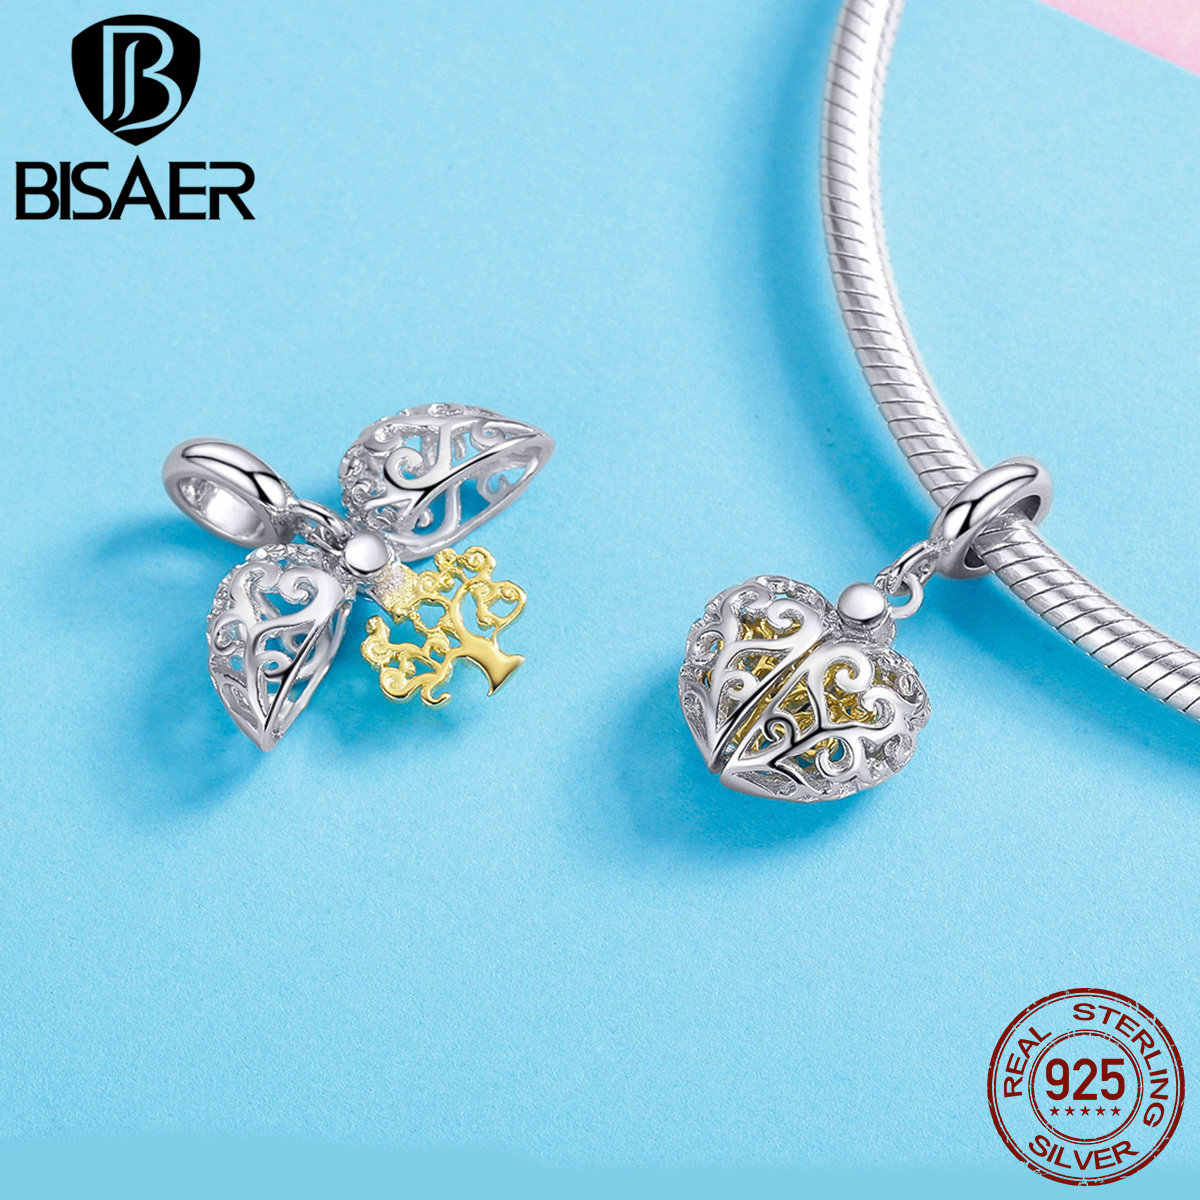 BISAER 925 เงินแท้ TREE OF LIFE SILVER DANGLE จี้ Beads Fit Charms สร้อยข้อมือ Zircon เงิน 925 เครื่องประดับ WEUS306